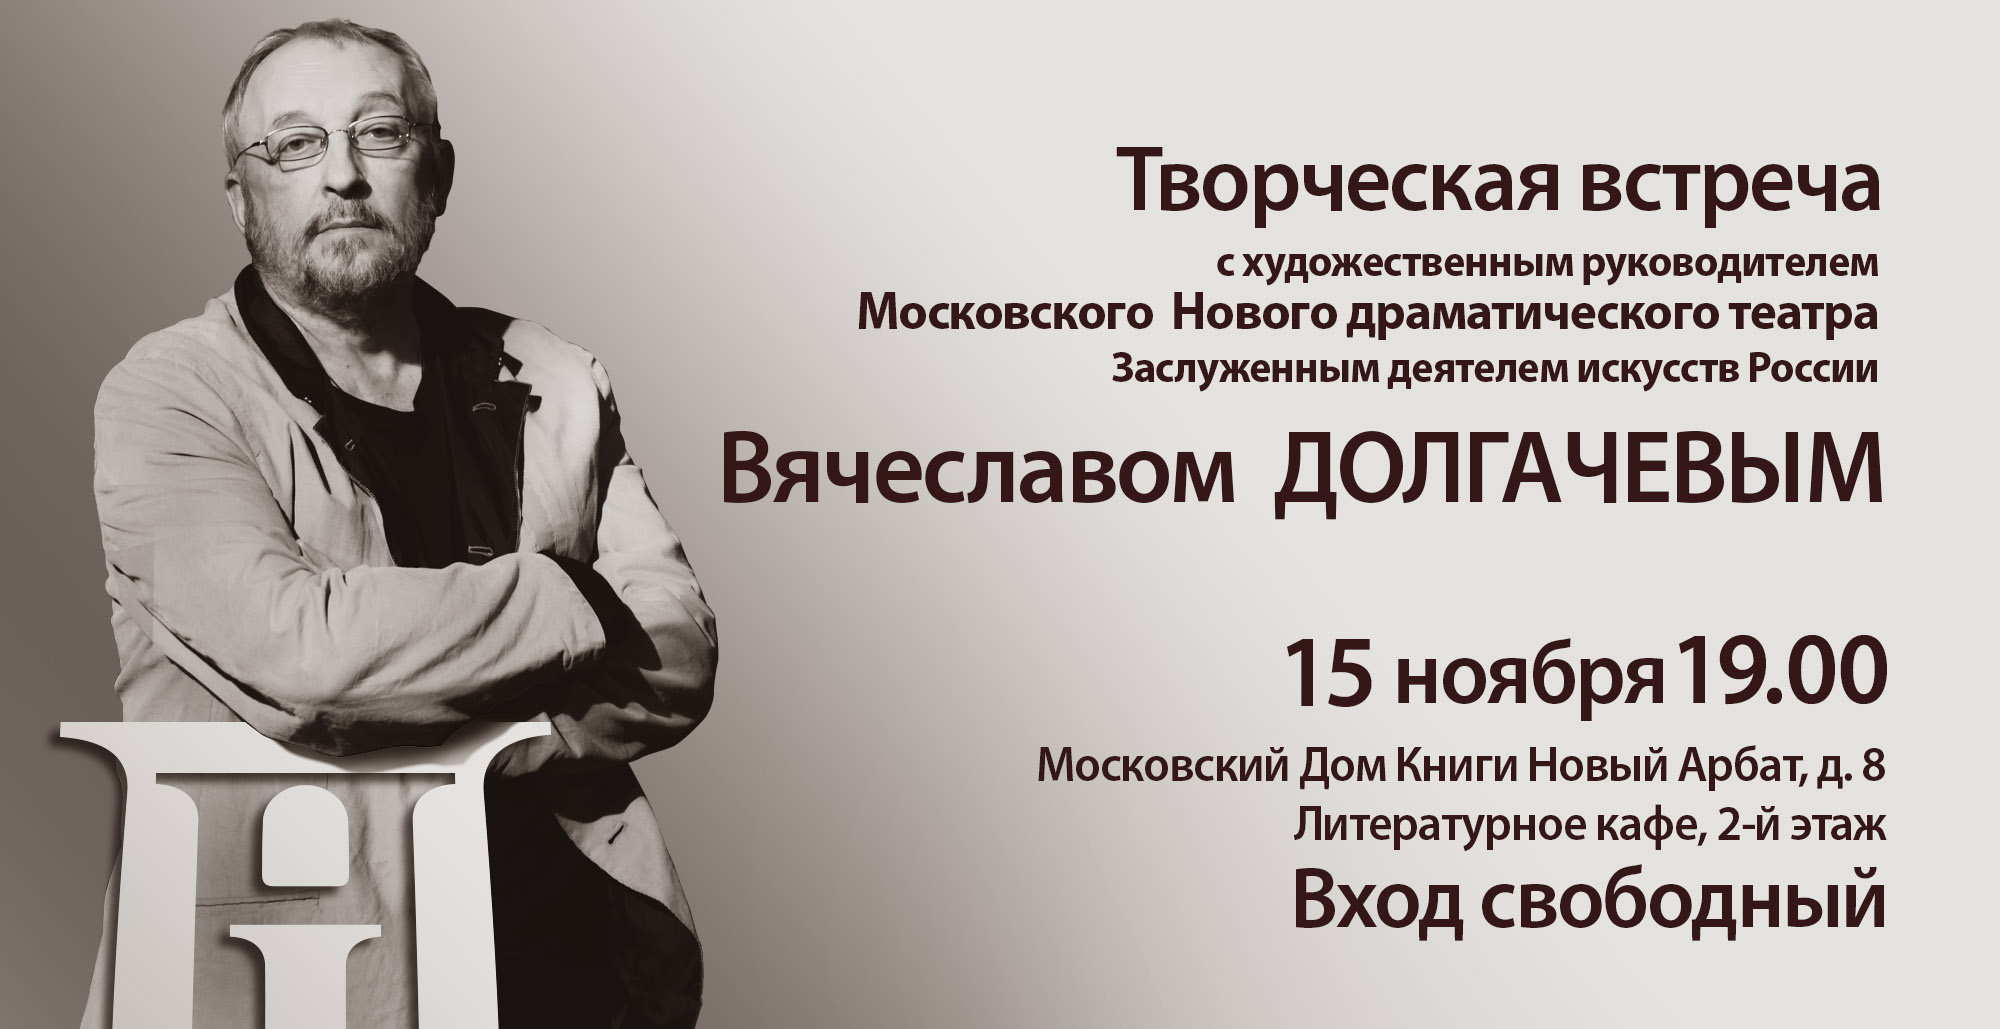 Вячеслав Долгачёв